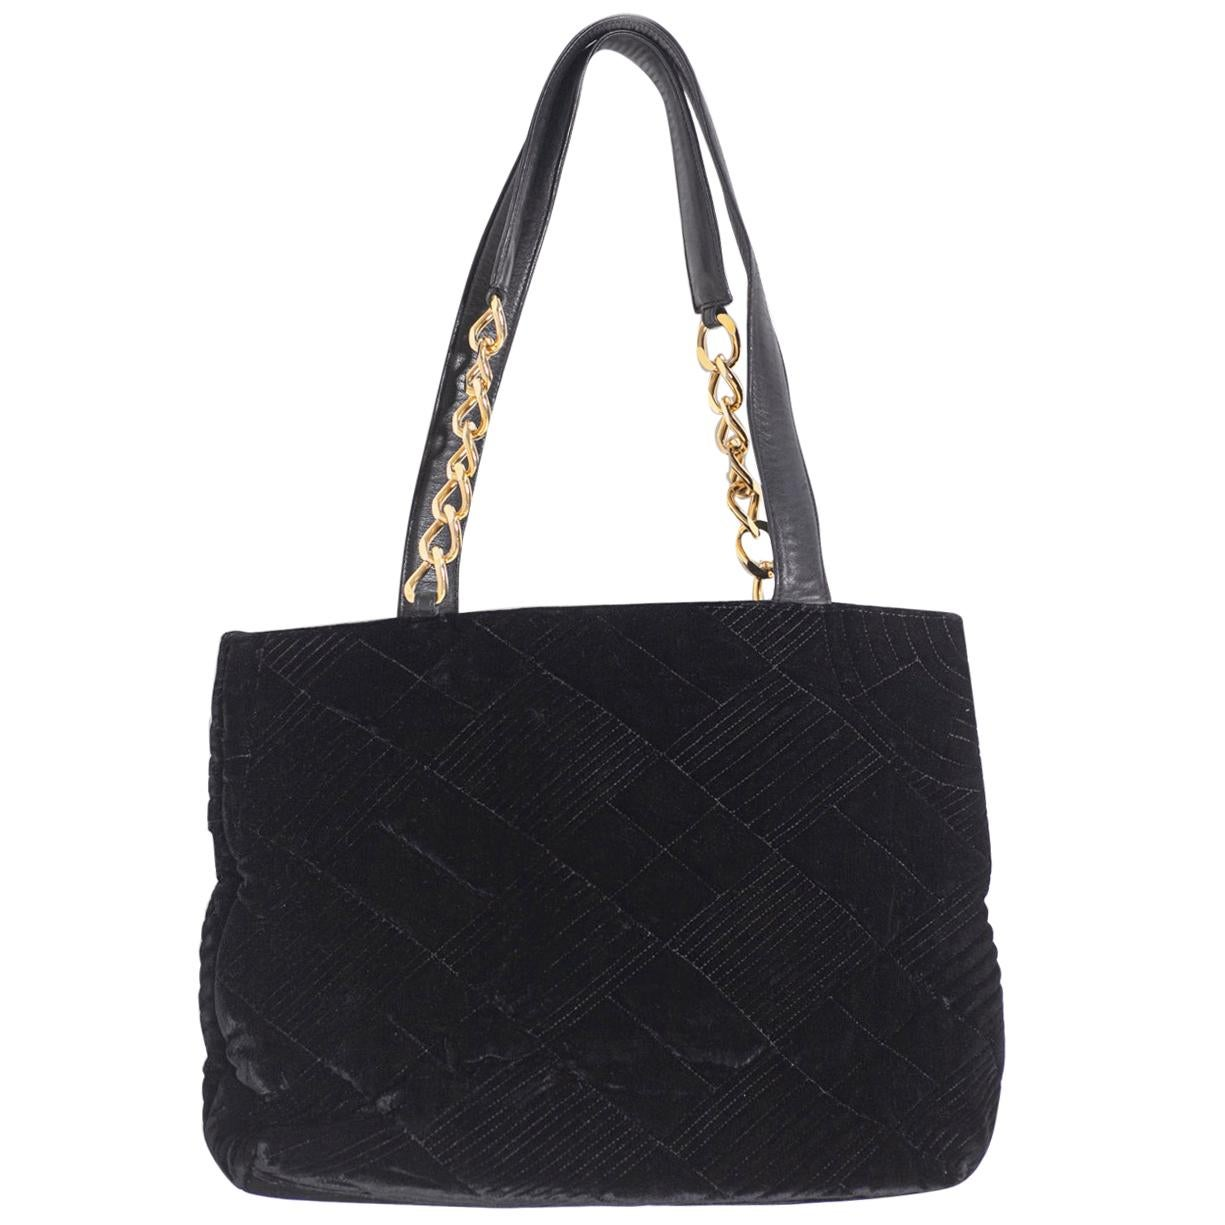 Gianni Versace Couture Black Velvet Tote Bag